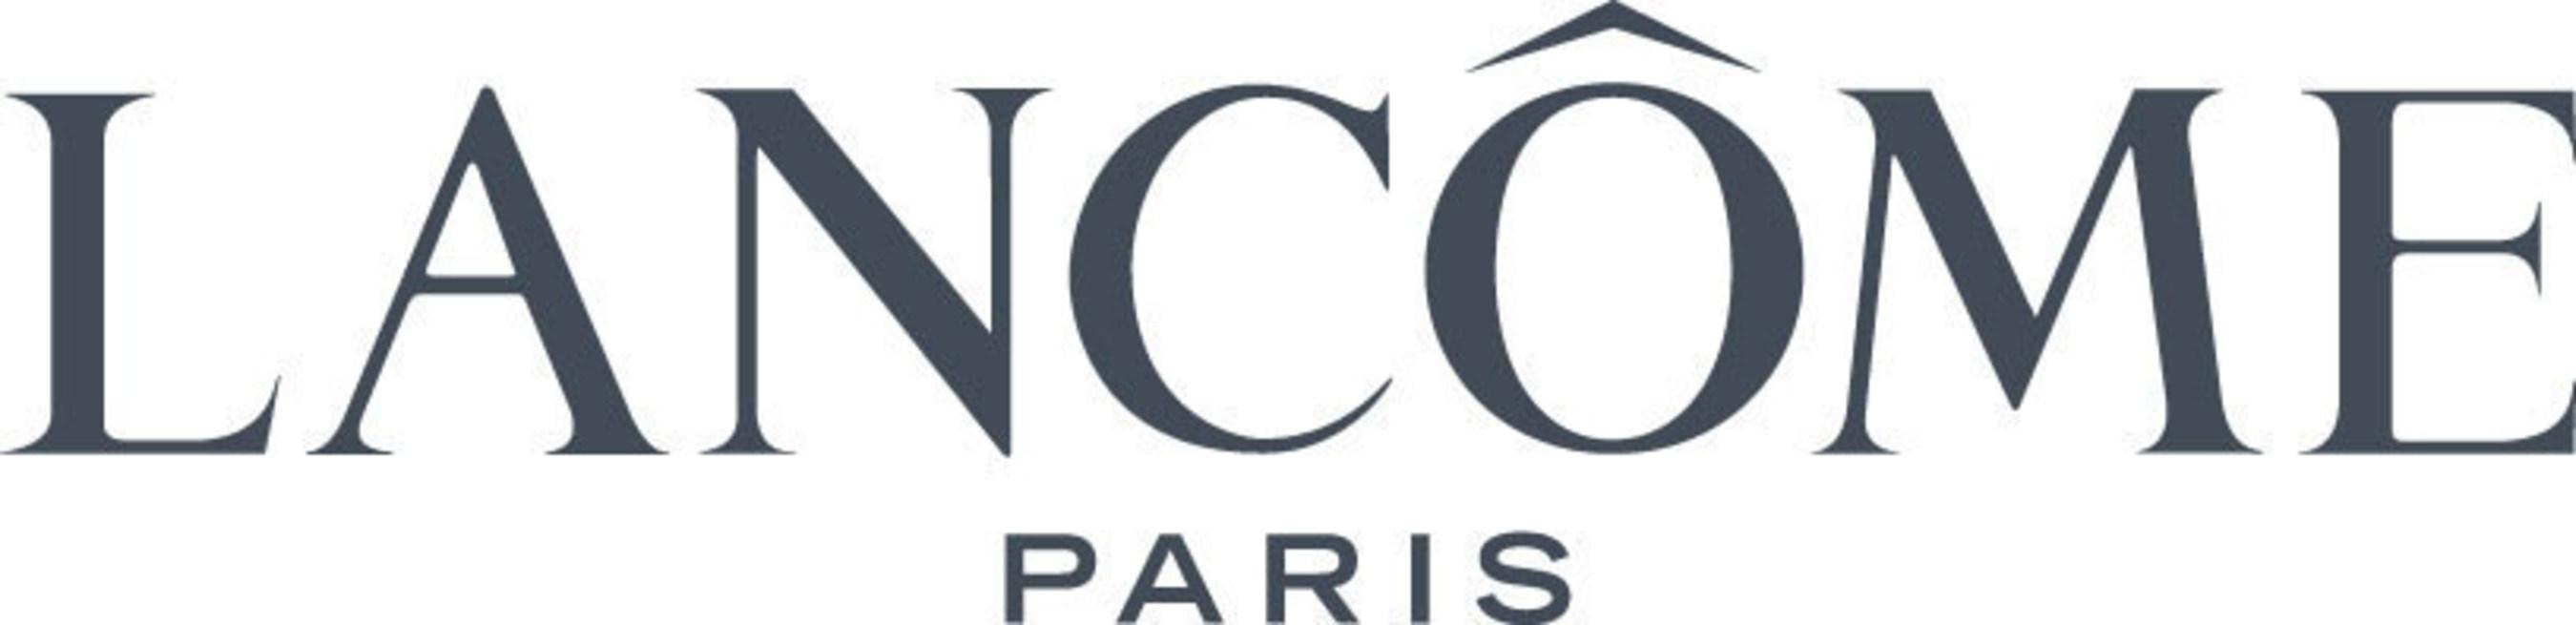 Lancome logo